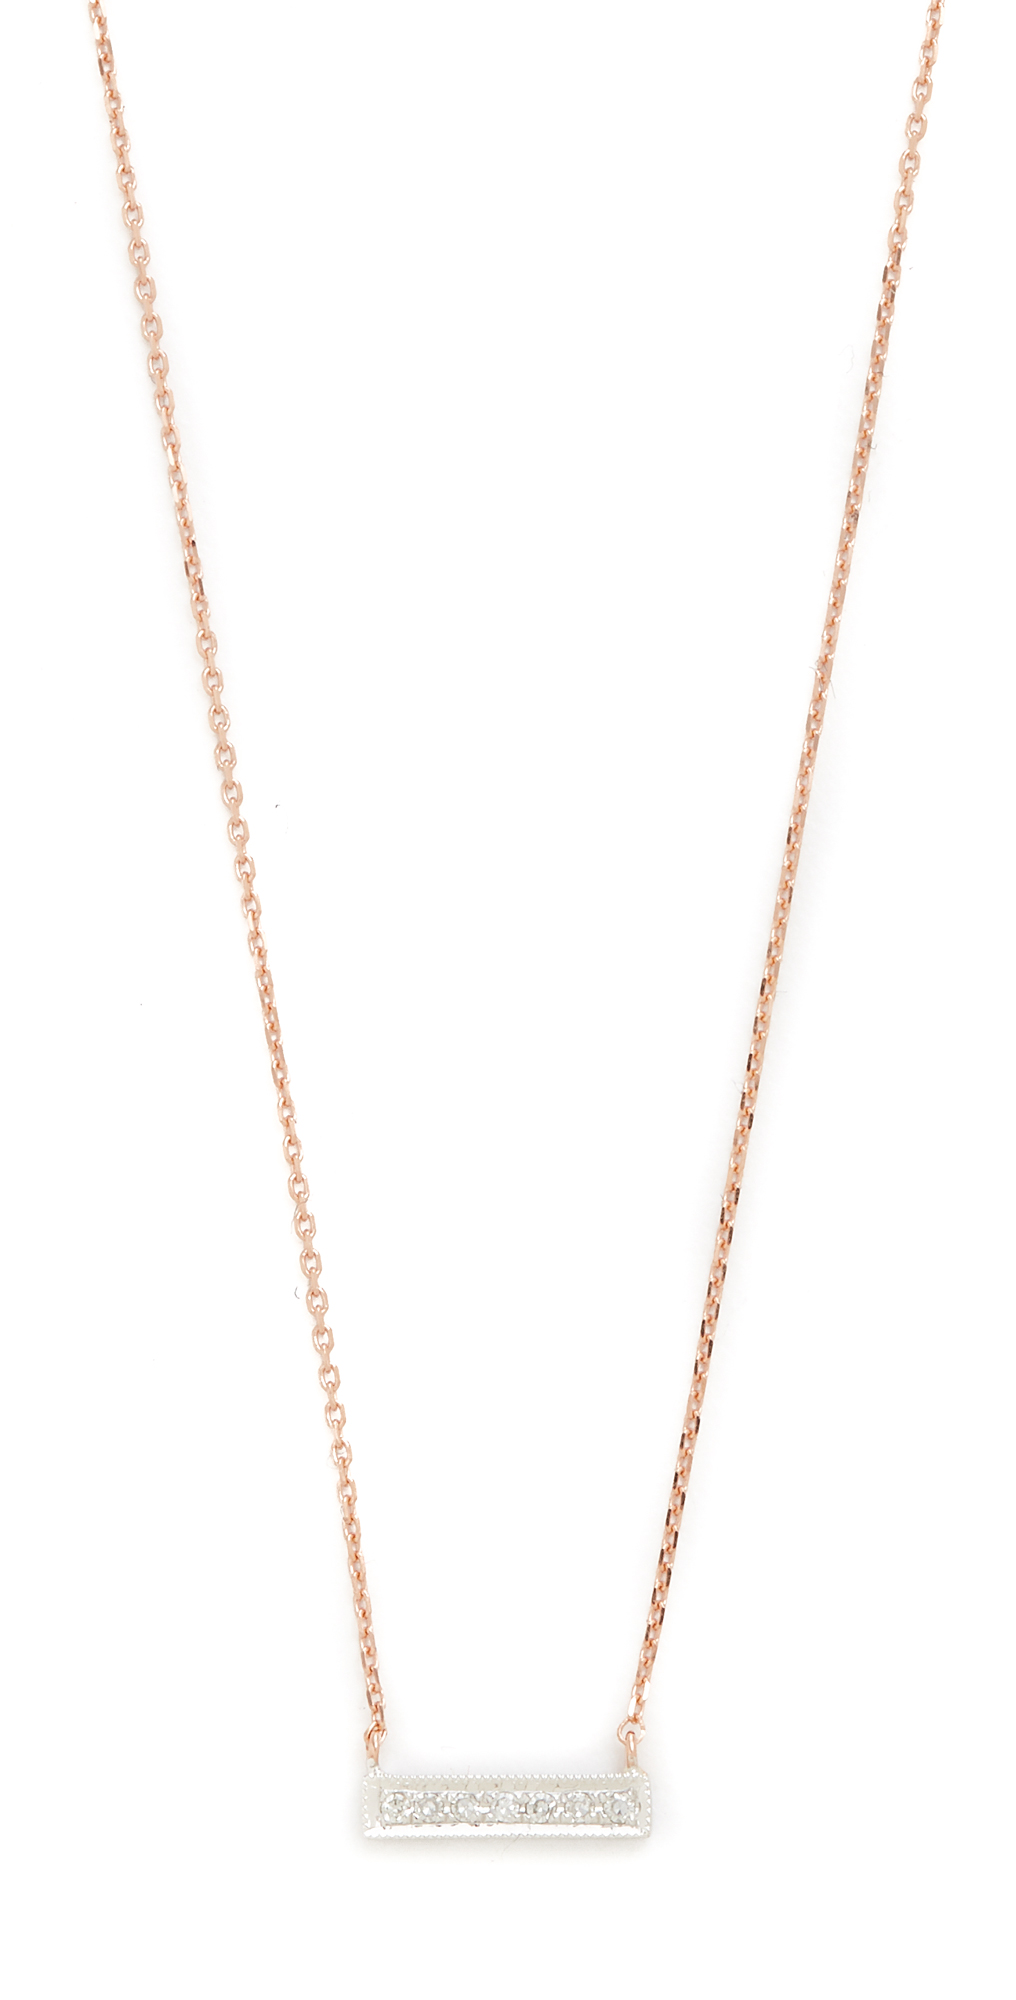 14k Rose Gold Sylvie Rose Bar Necklace Dana Rebecca